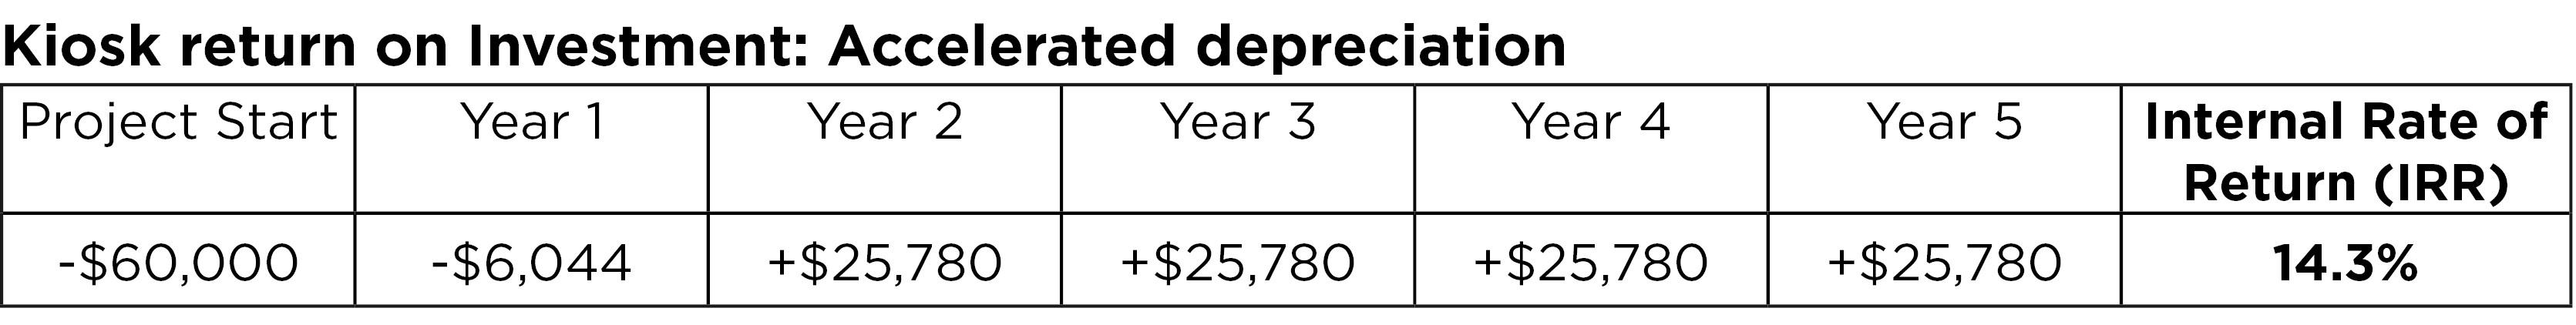 Kiosk return on investment: Accelerated depreciation